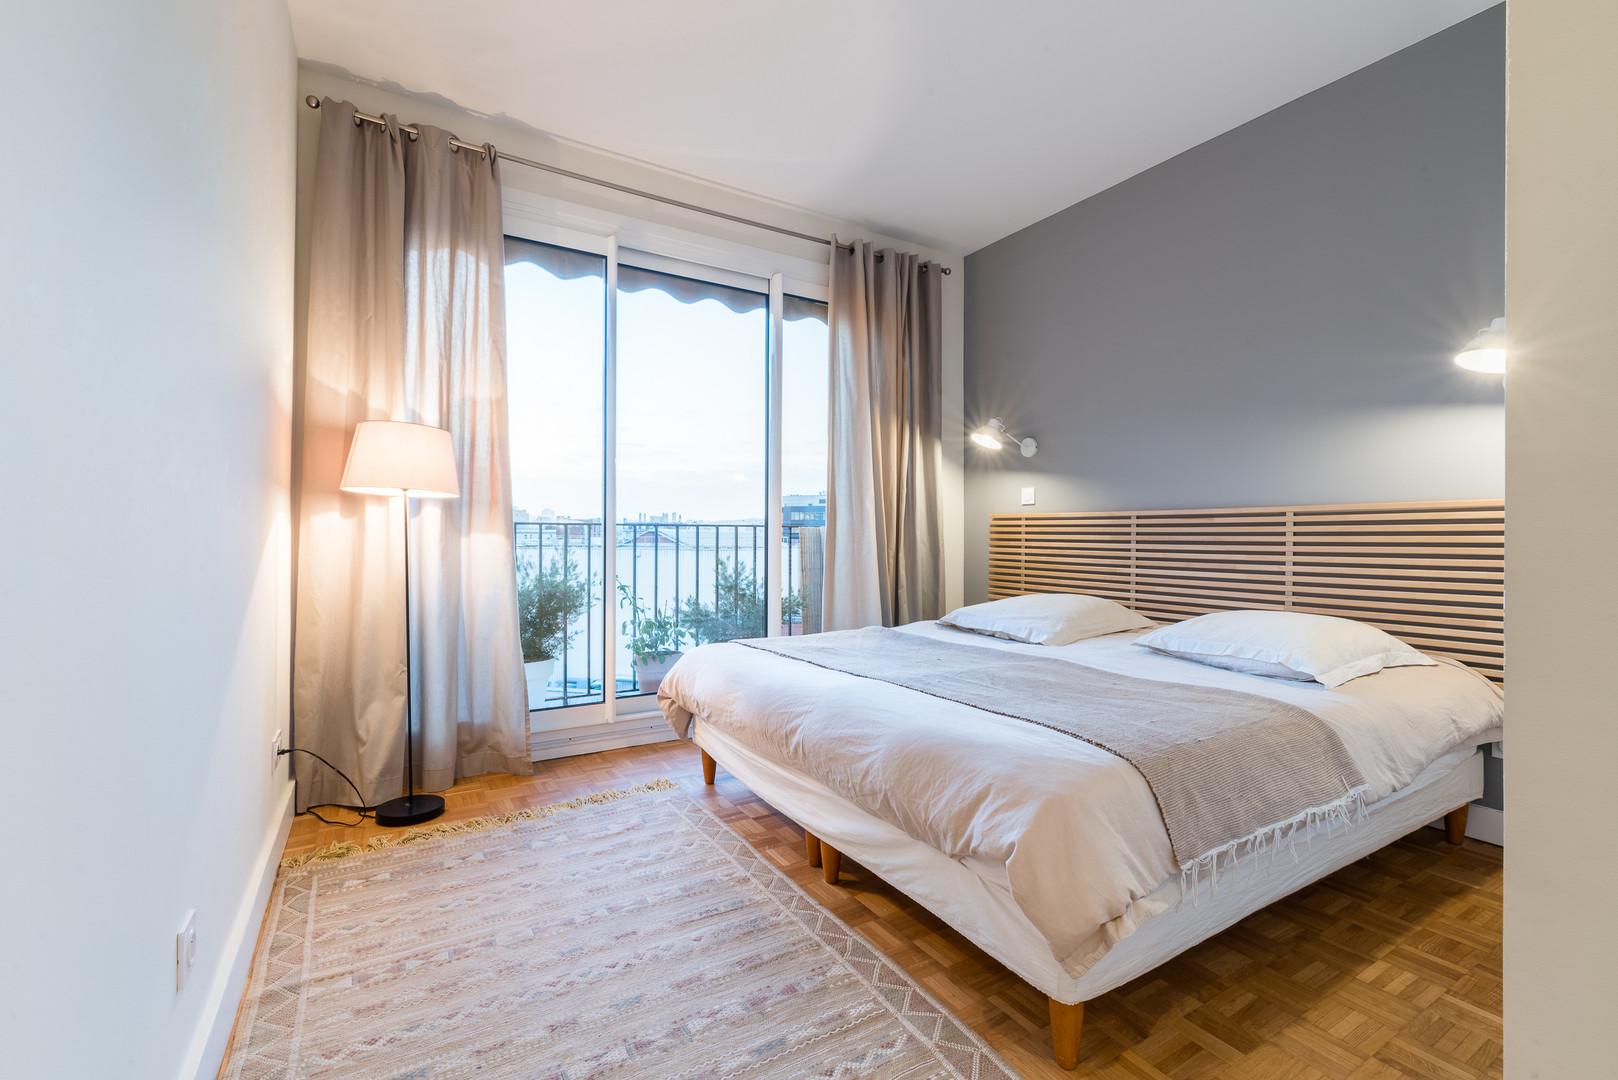 8_2017-12-14-Appartement Boulogne-1.jpg